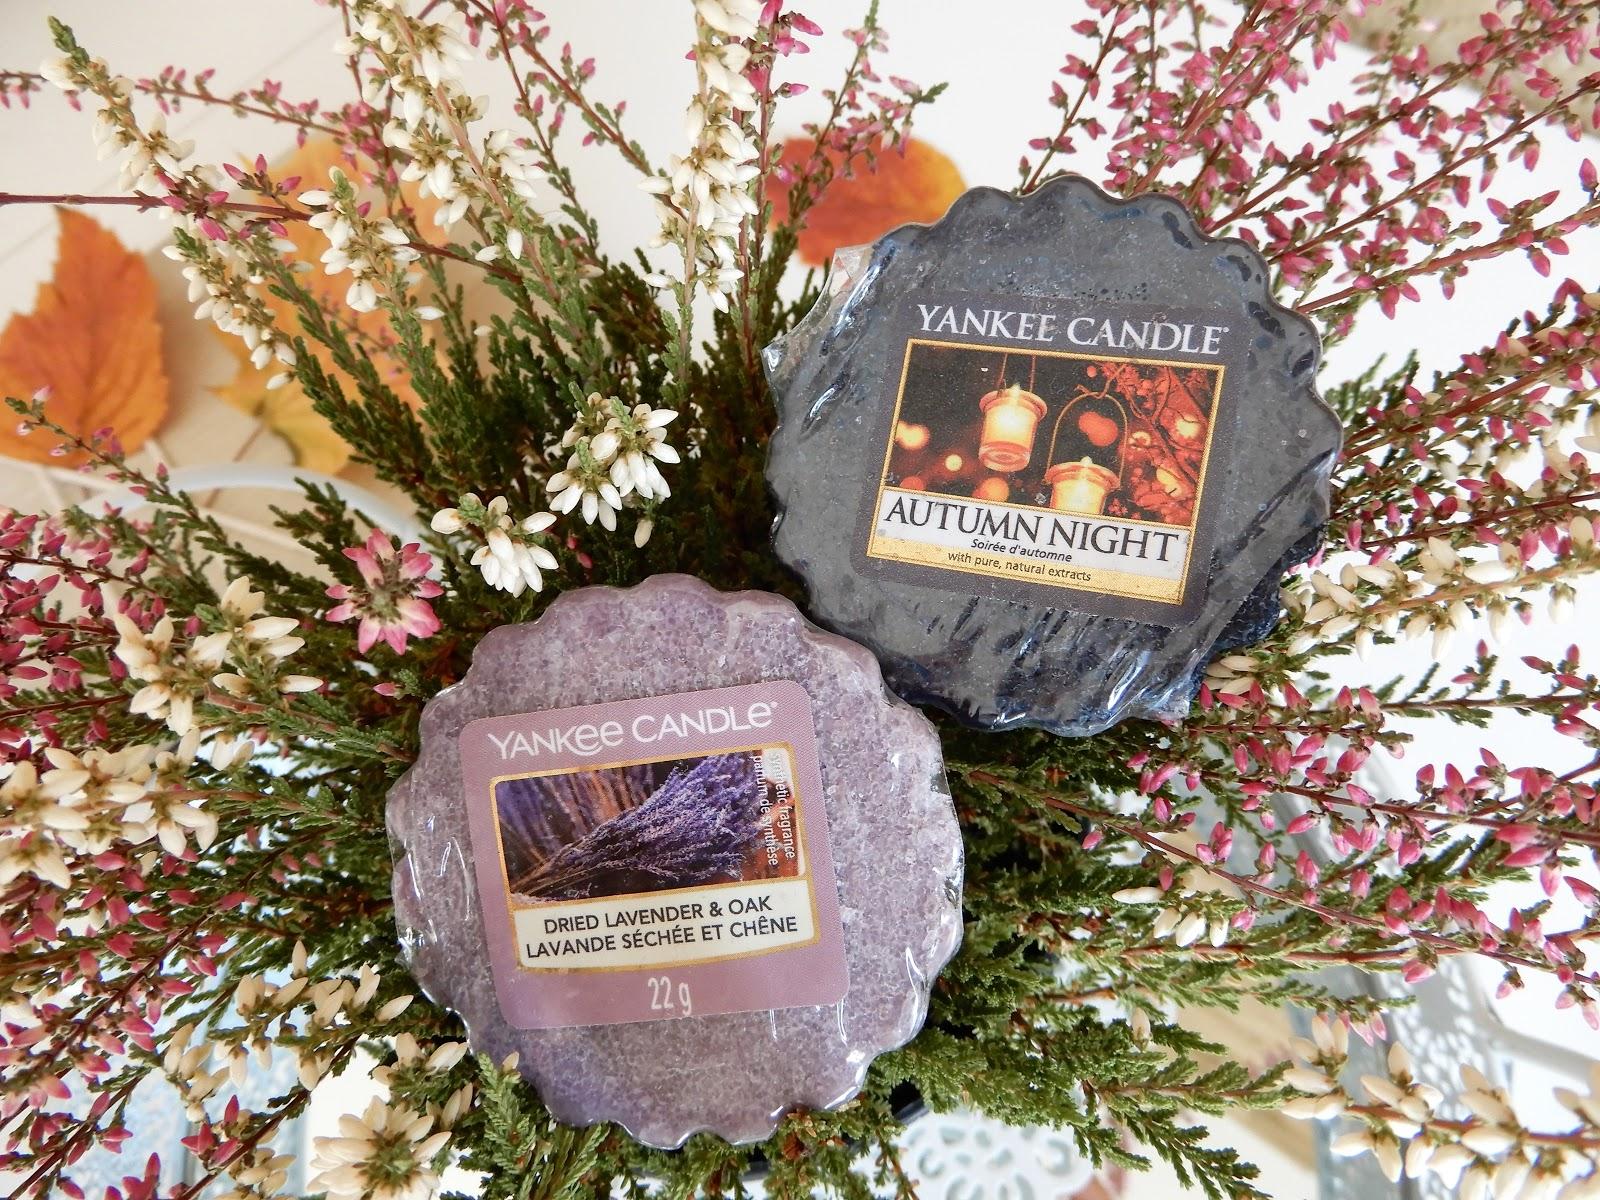 Woski Yankee Candle| Autumn Night i Dried Lavender&Oak